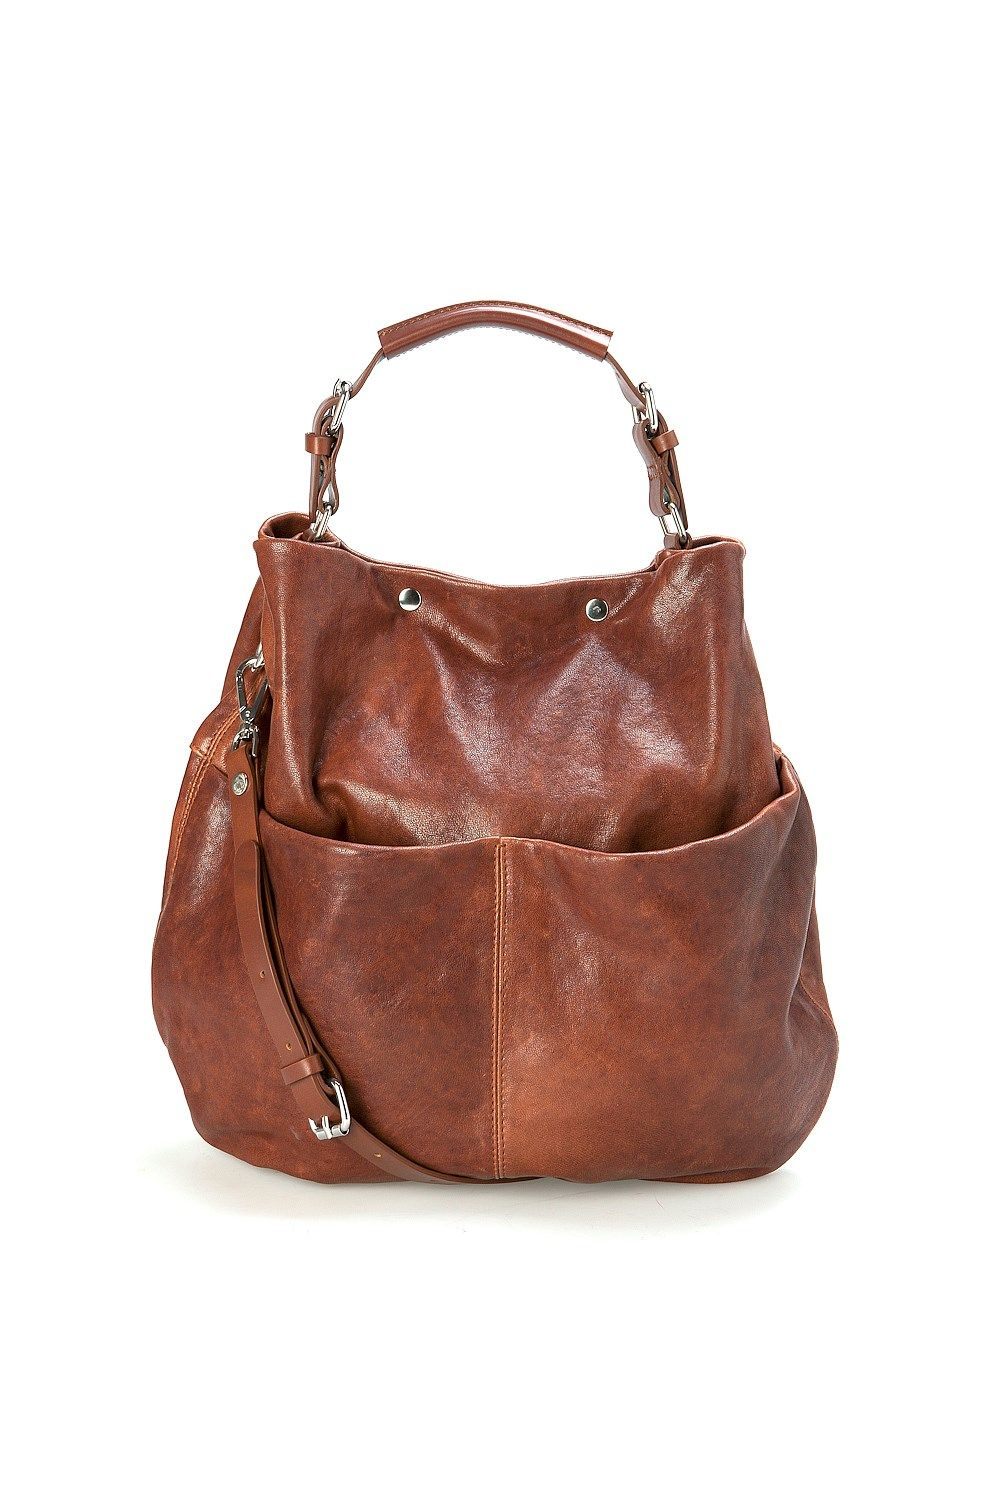 Country Road Handbags